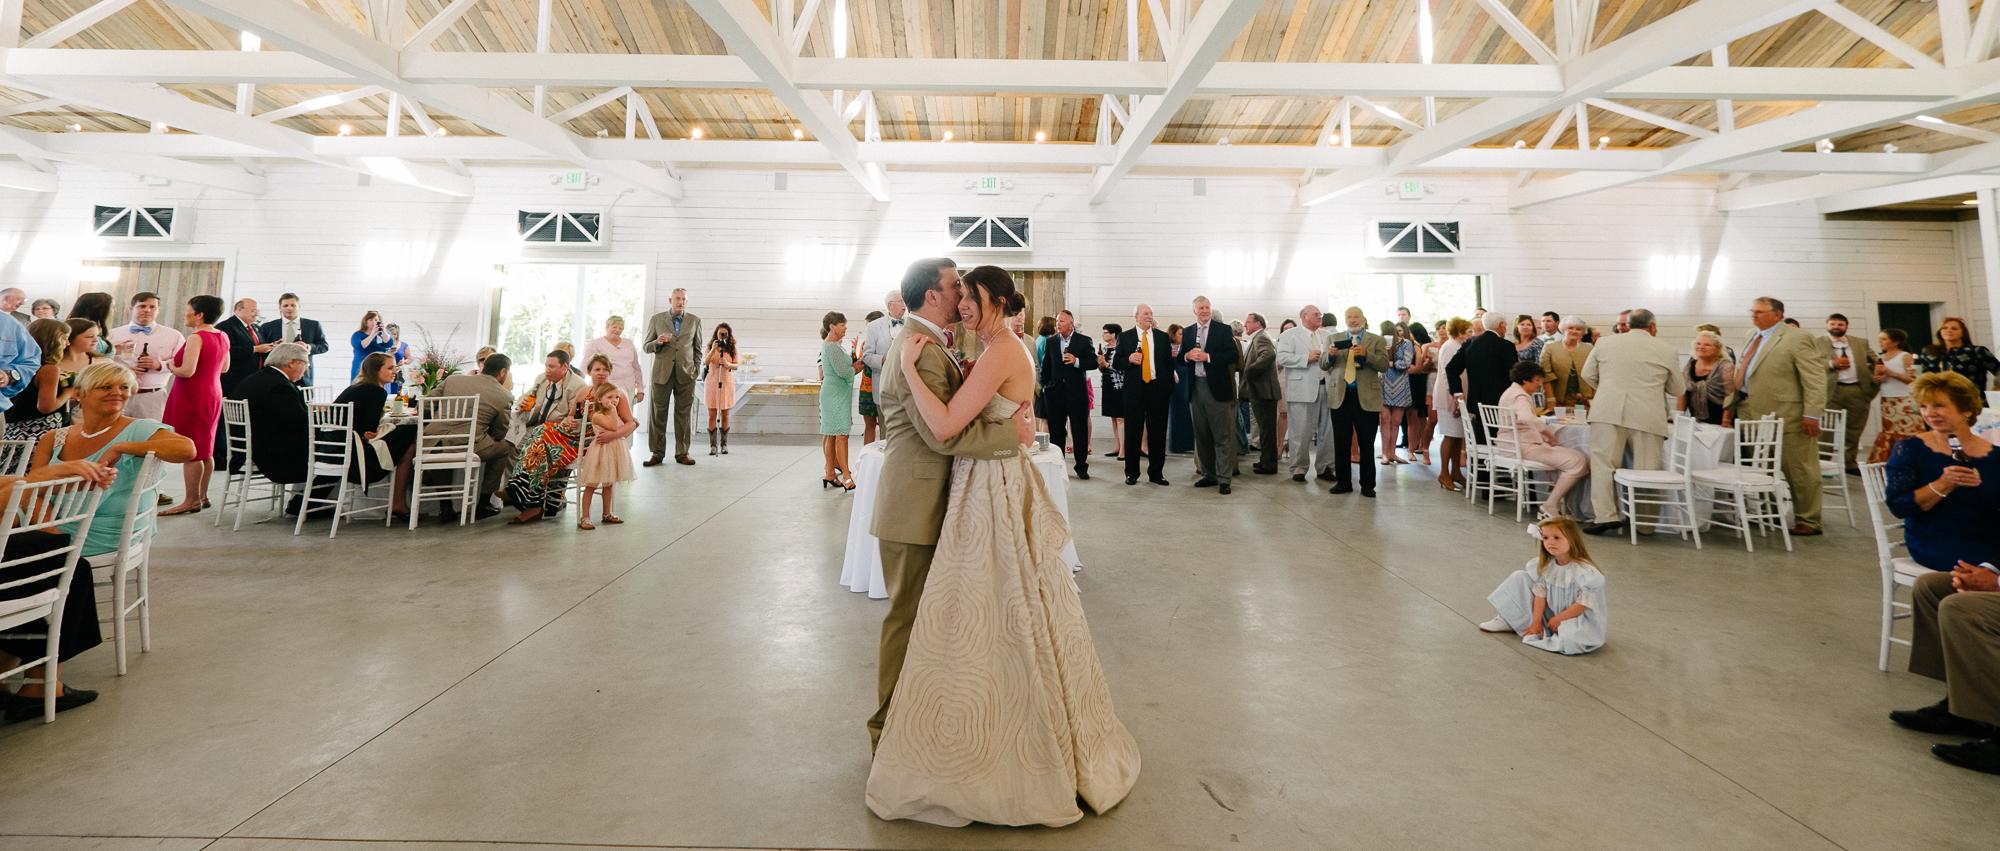 Langley-Smith-wedding-blog-28.jpg